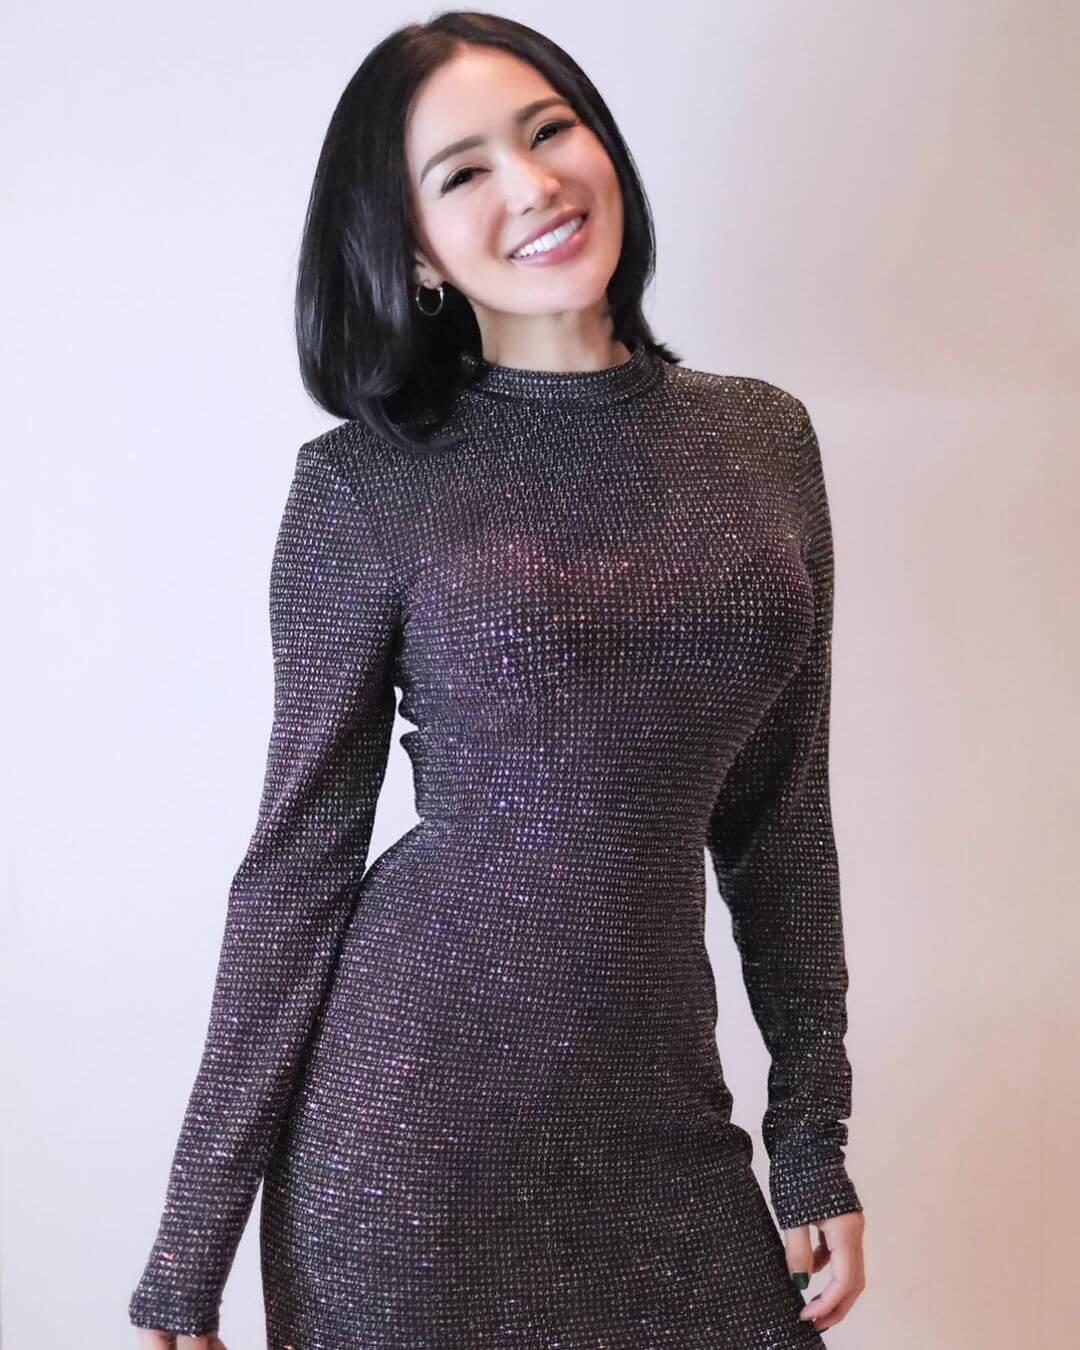 Wika Salim In Black Dress